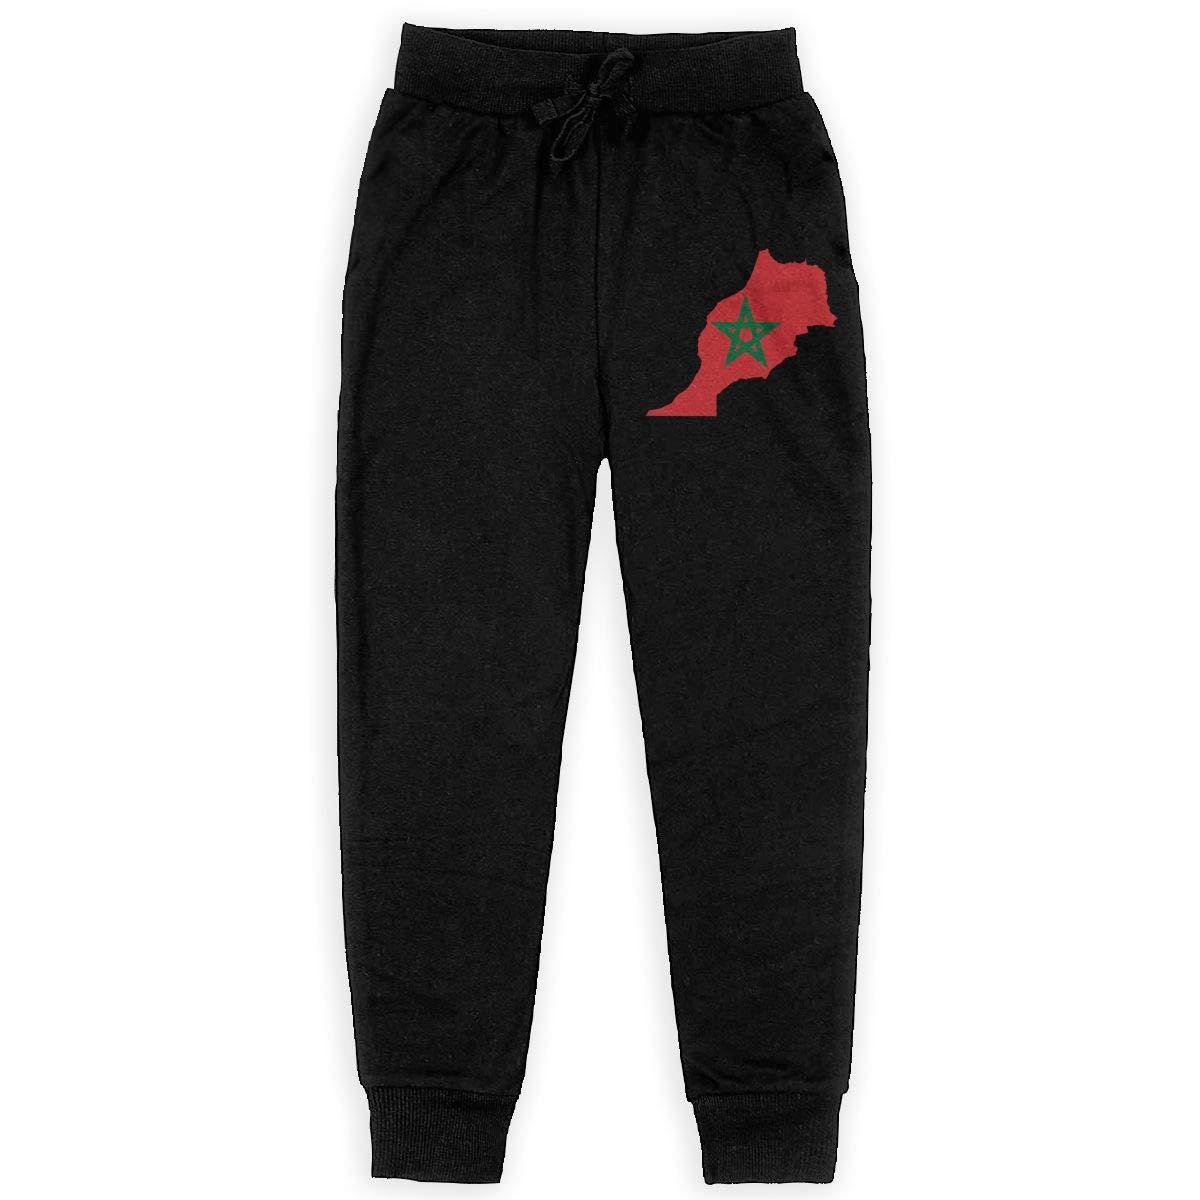 Dunpaiaa Morocco Flag Map Boys Sweatpants,Joggers Sport Training Pants Trousers Black